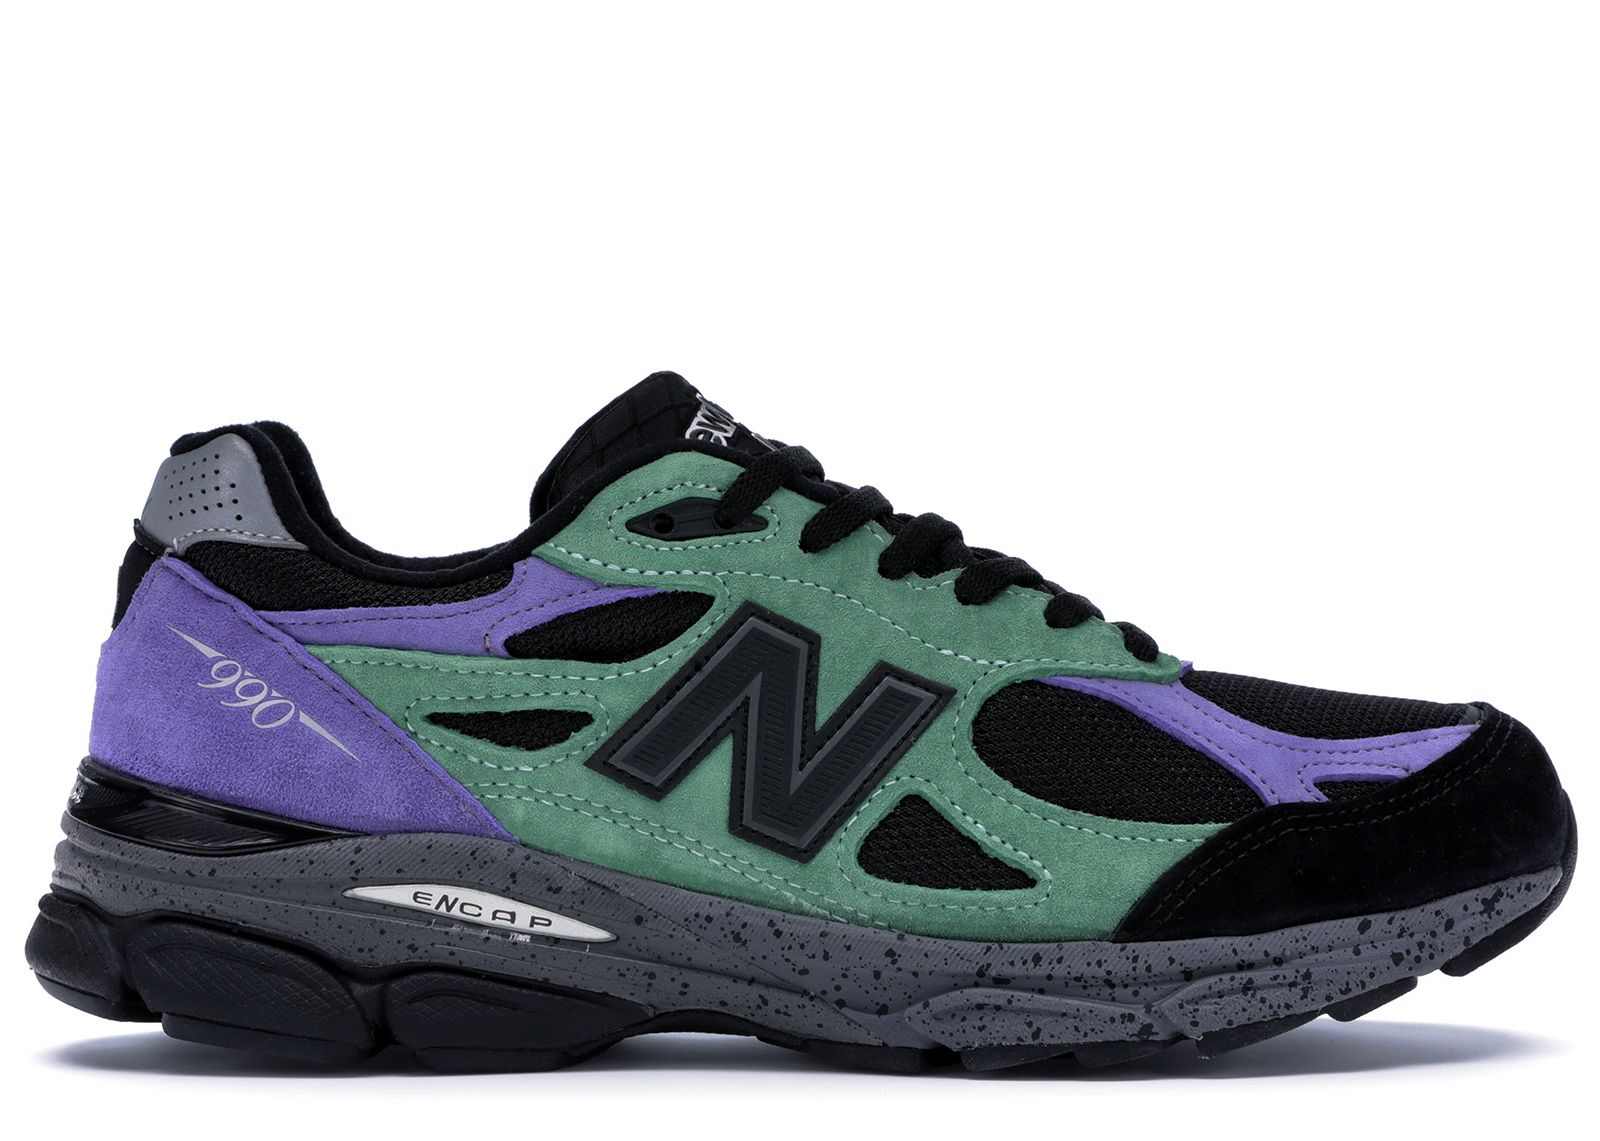 NEW BALANCE 990V3 STRAY RATS. newbalance shoes New